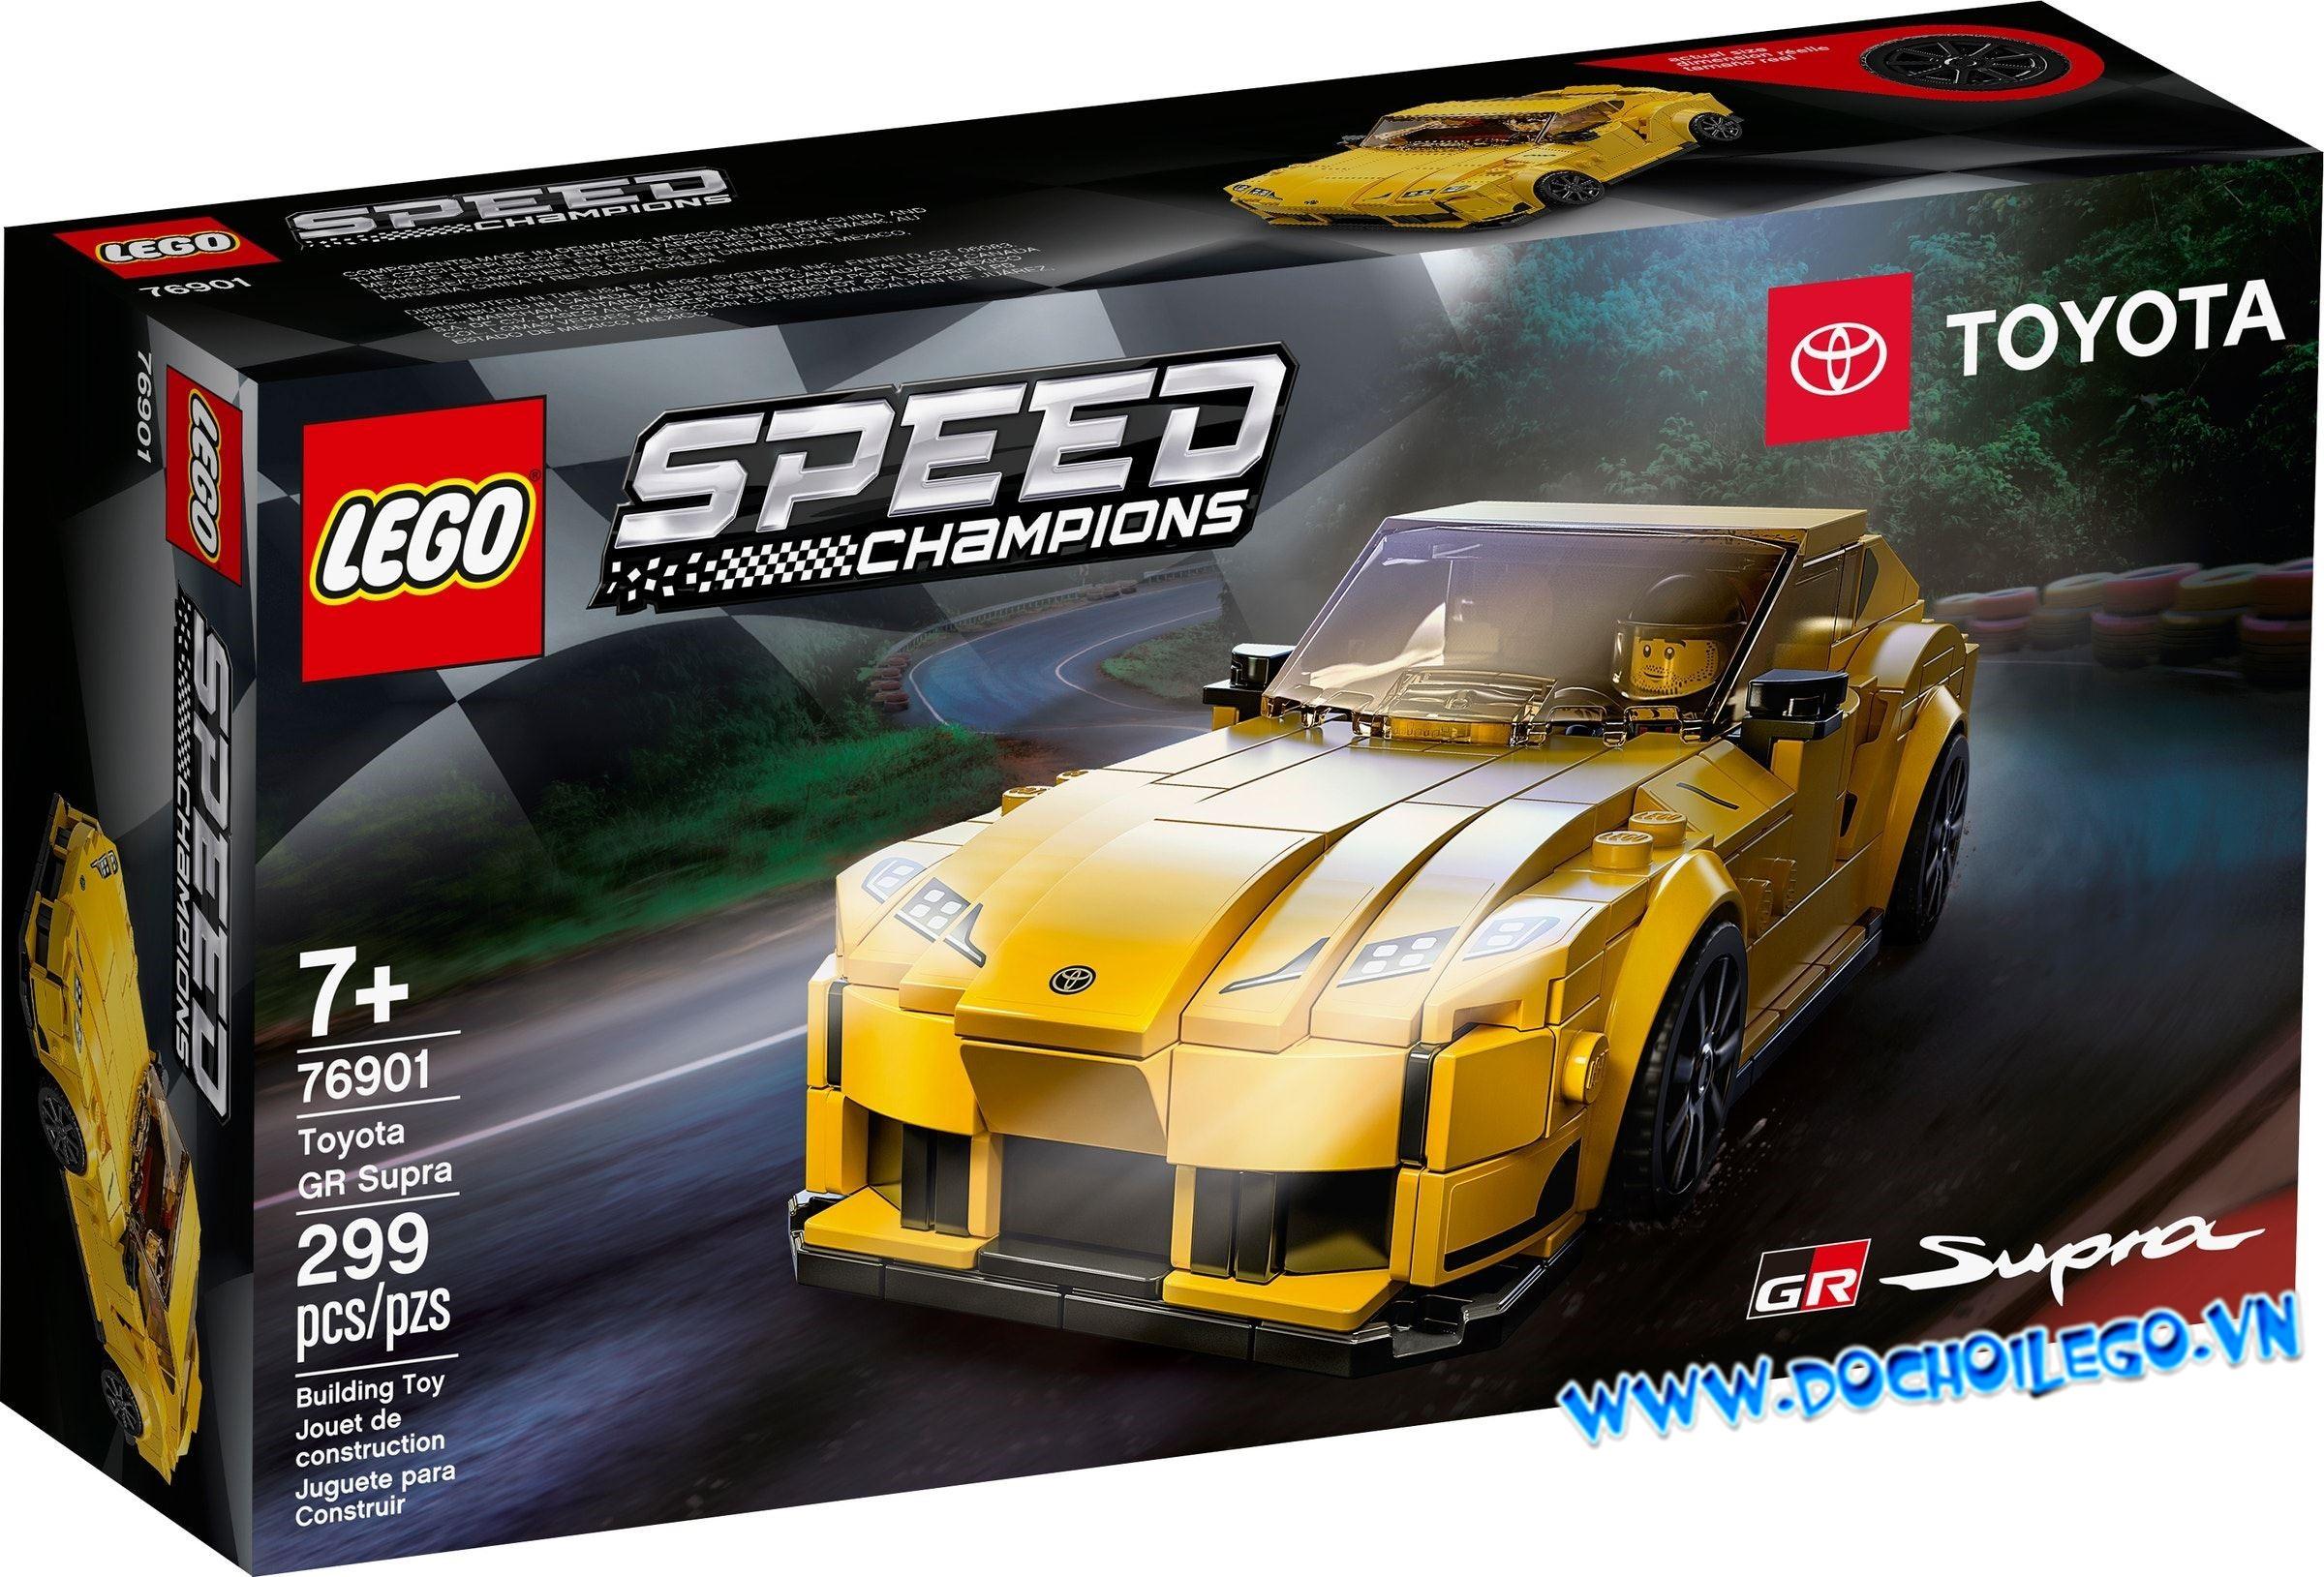 76901 LEGO Speed Champions Toyota GR Supra - Đồ chơi LEGO